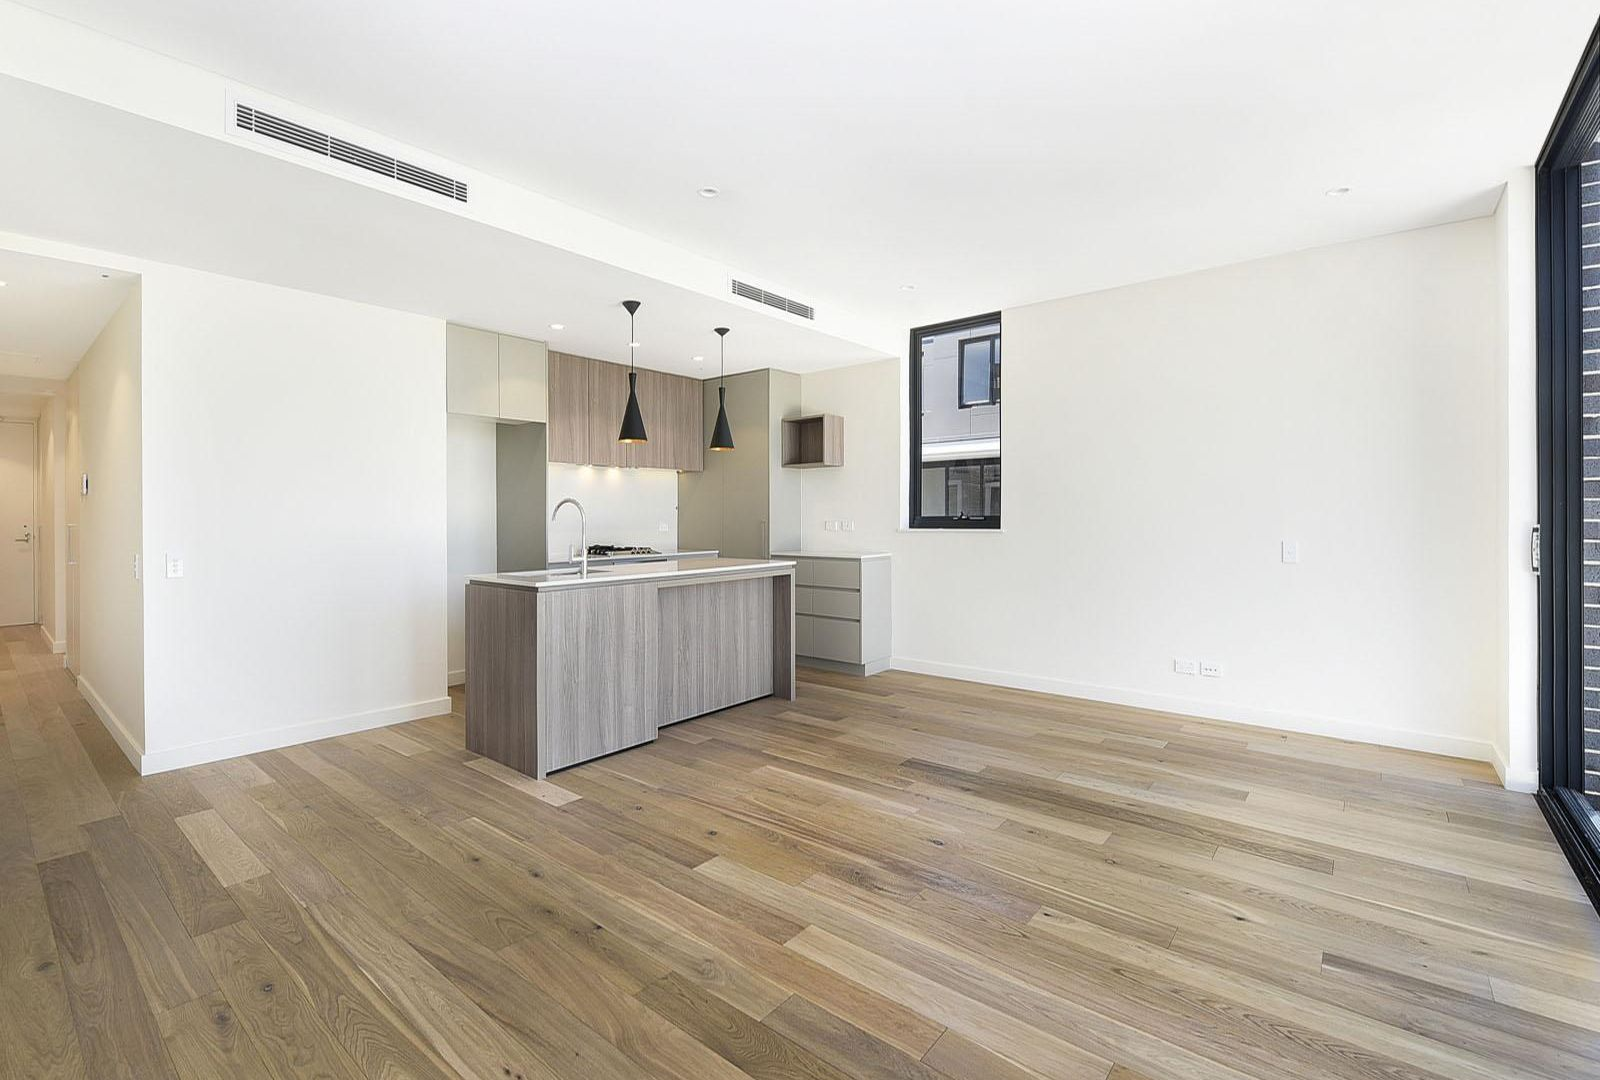 B622/2 Livingstone Avenue, Pymble NSW 2073, Image 2